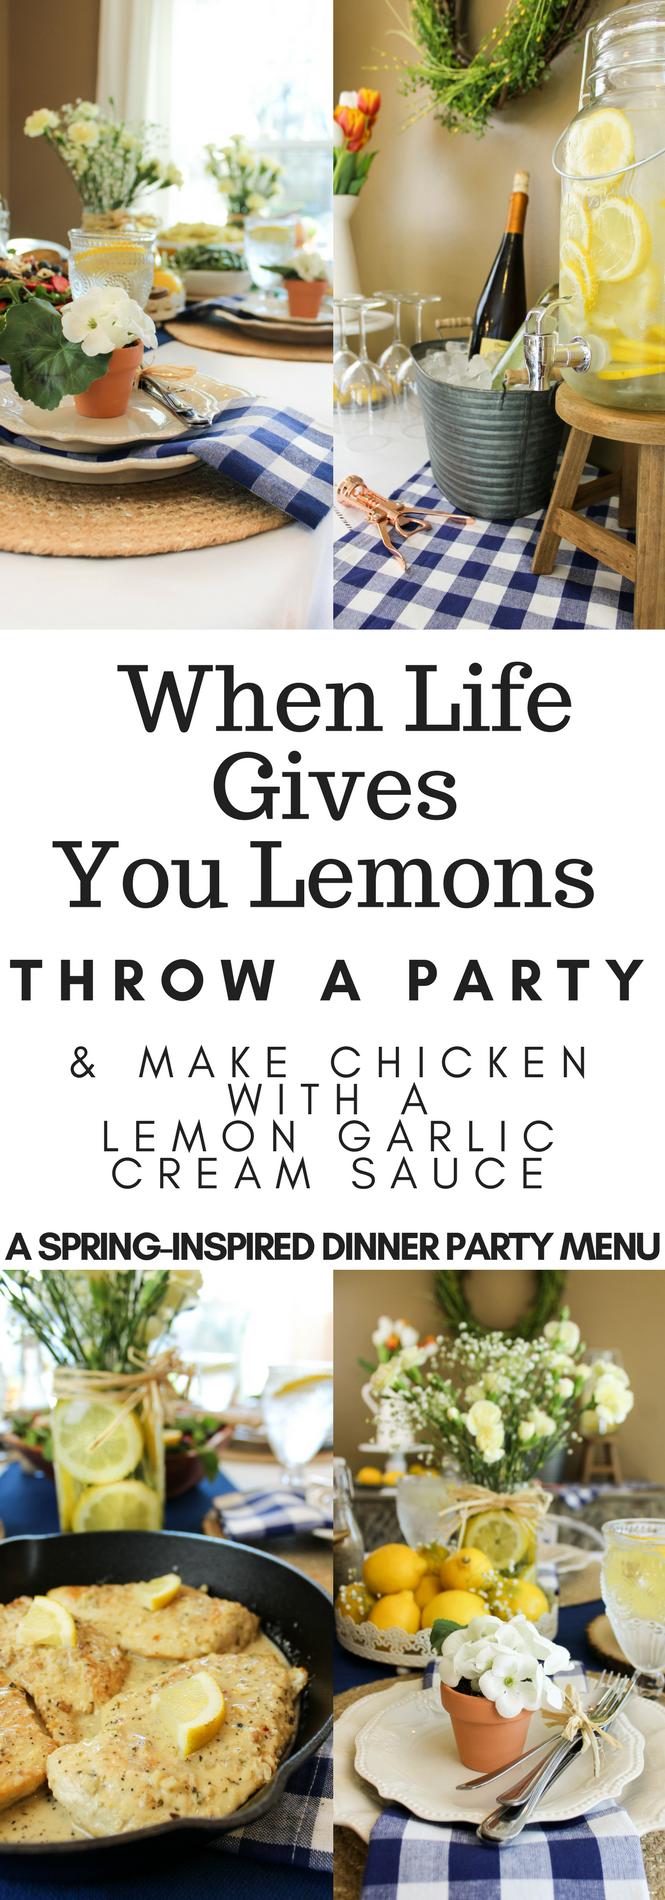 Garlic Chicken with Lemon Garlic Cream Sauce, #ad, #WhatAGoodThyme, Lemon Tablescape, Spring party tablescape, spring dinner menu, Thyme & Table @thymeandtable